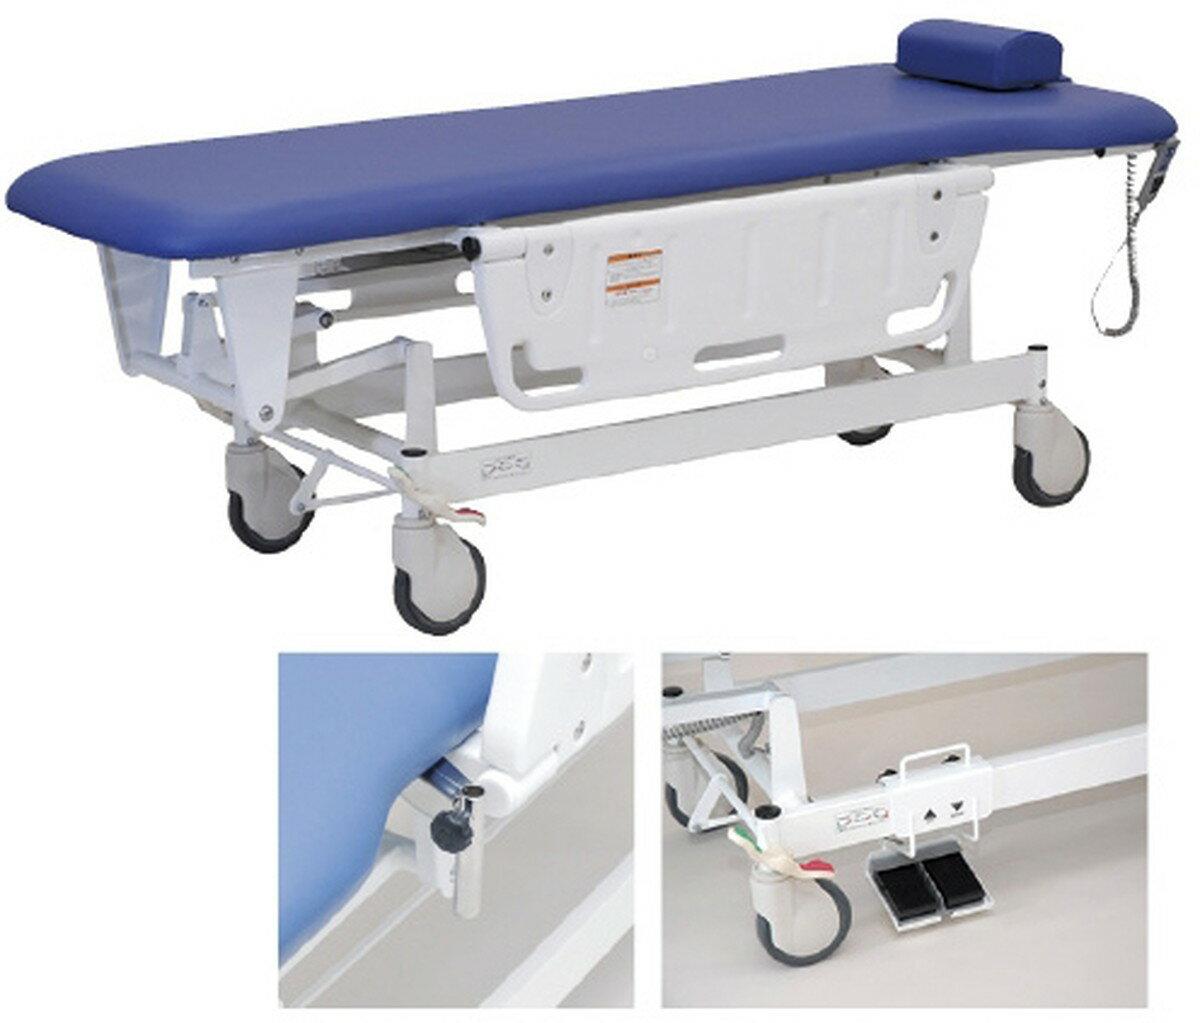 身体測定器・医療計測器, その他 15-MS TB-511() my24-4099-10-- 1-MYJAN 4523725006851